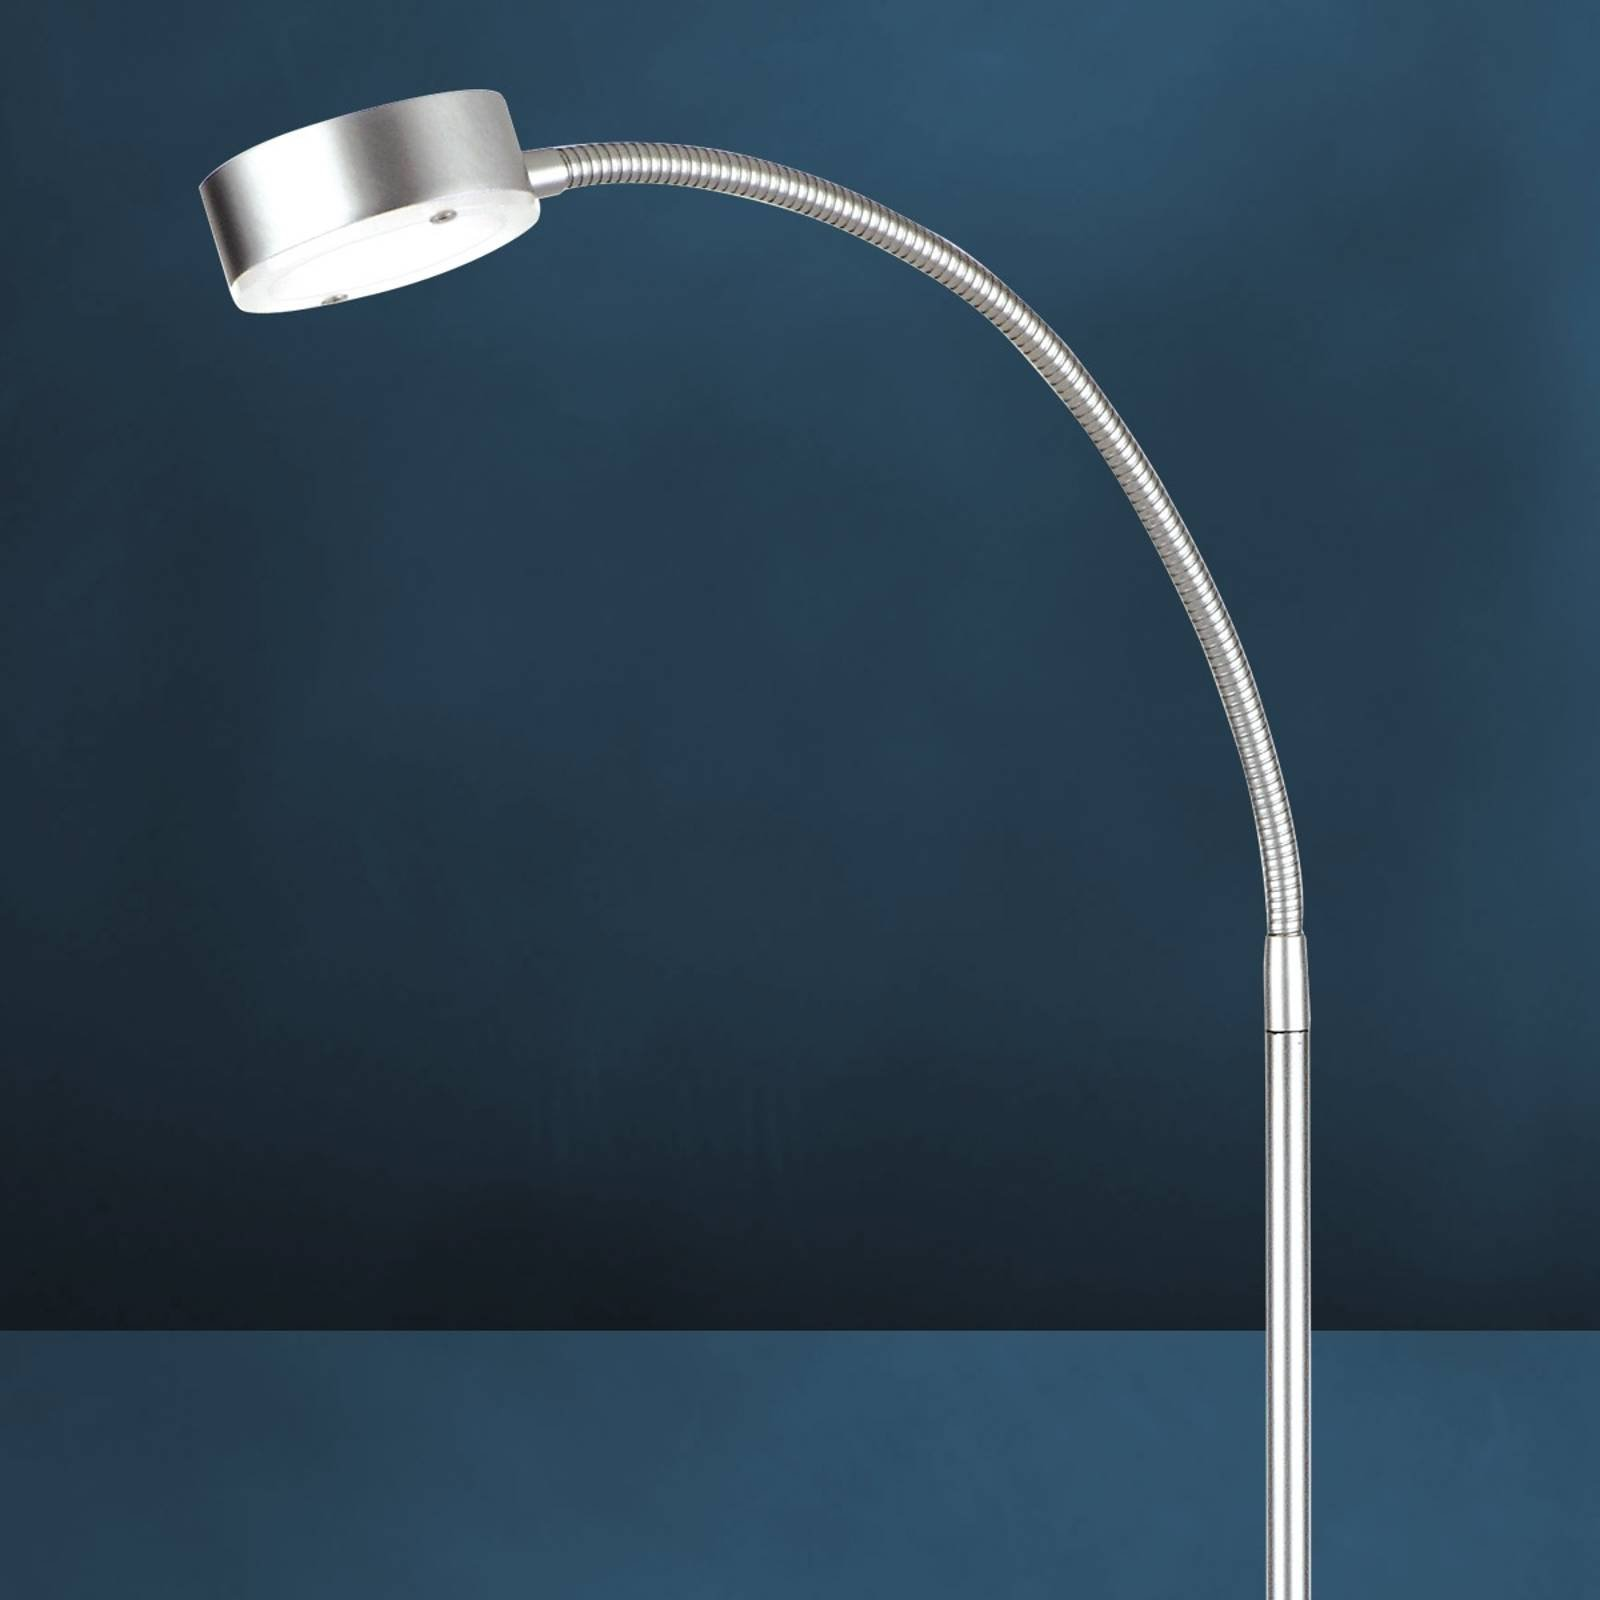 Fleksibel LED-gulvlampe SATURN, 1 lyskilde